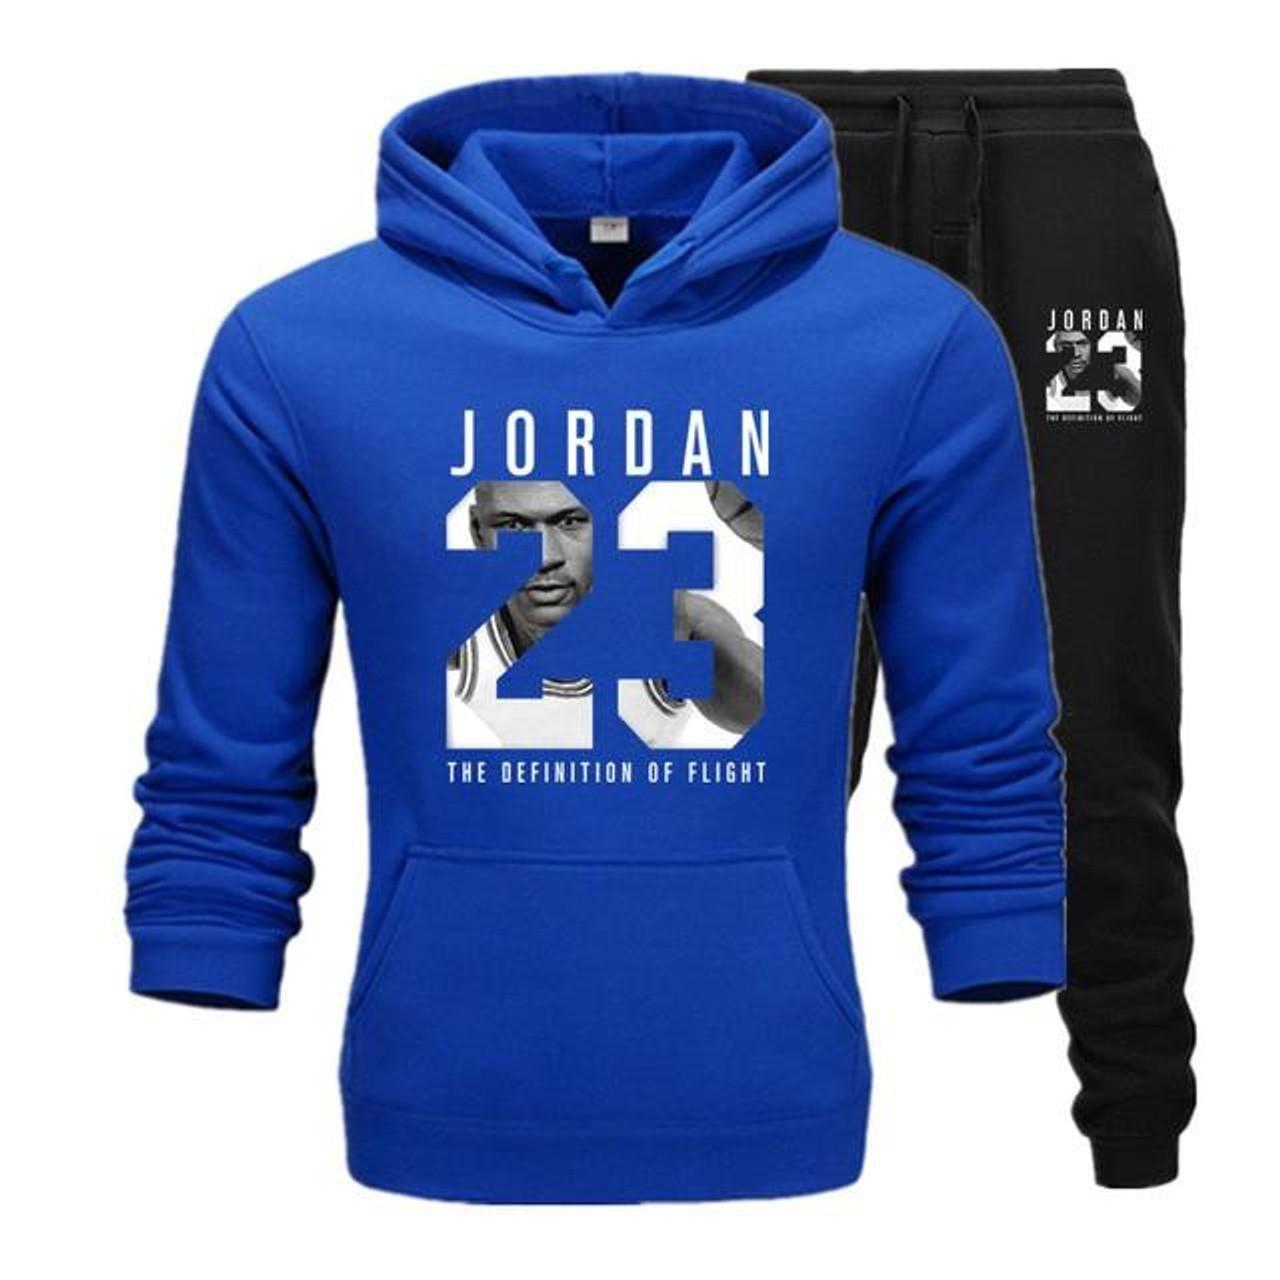 Jordan 23 Tracksuit Suit Fleece Hoodie